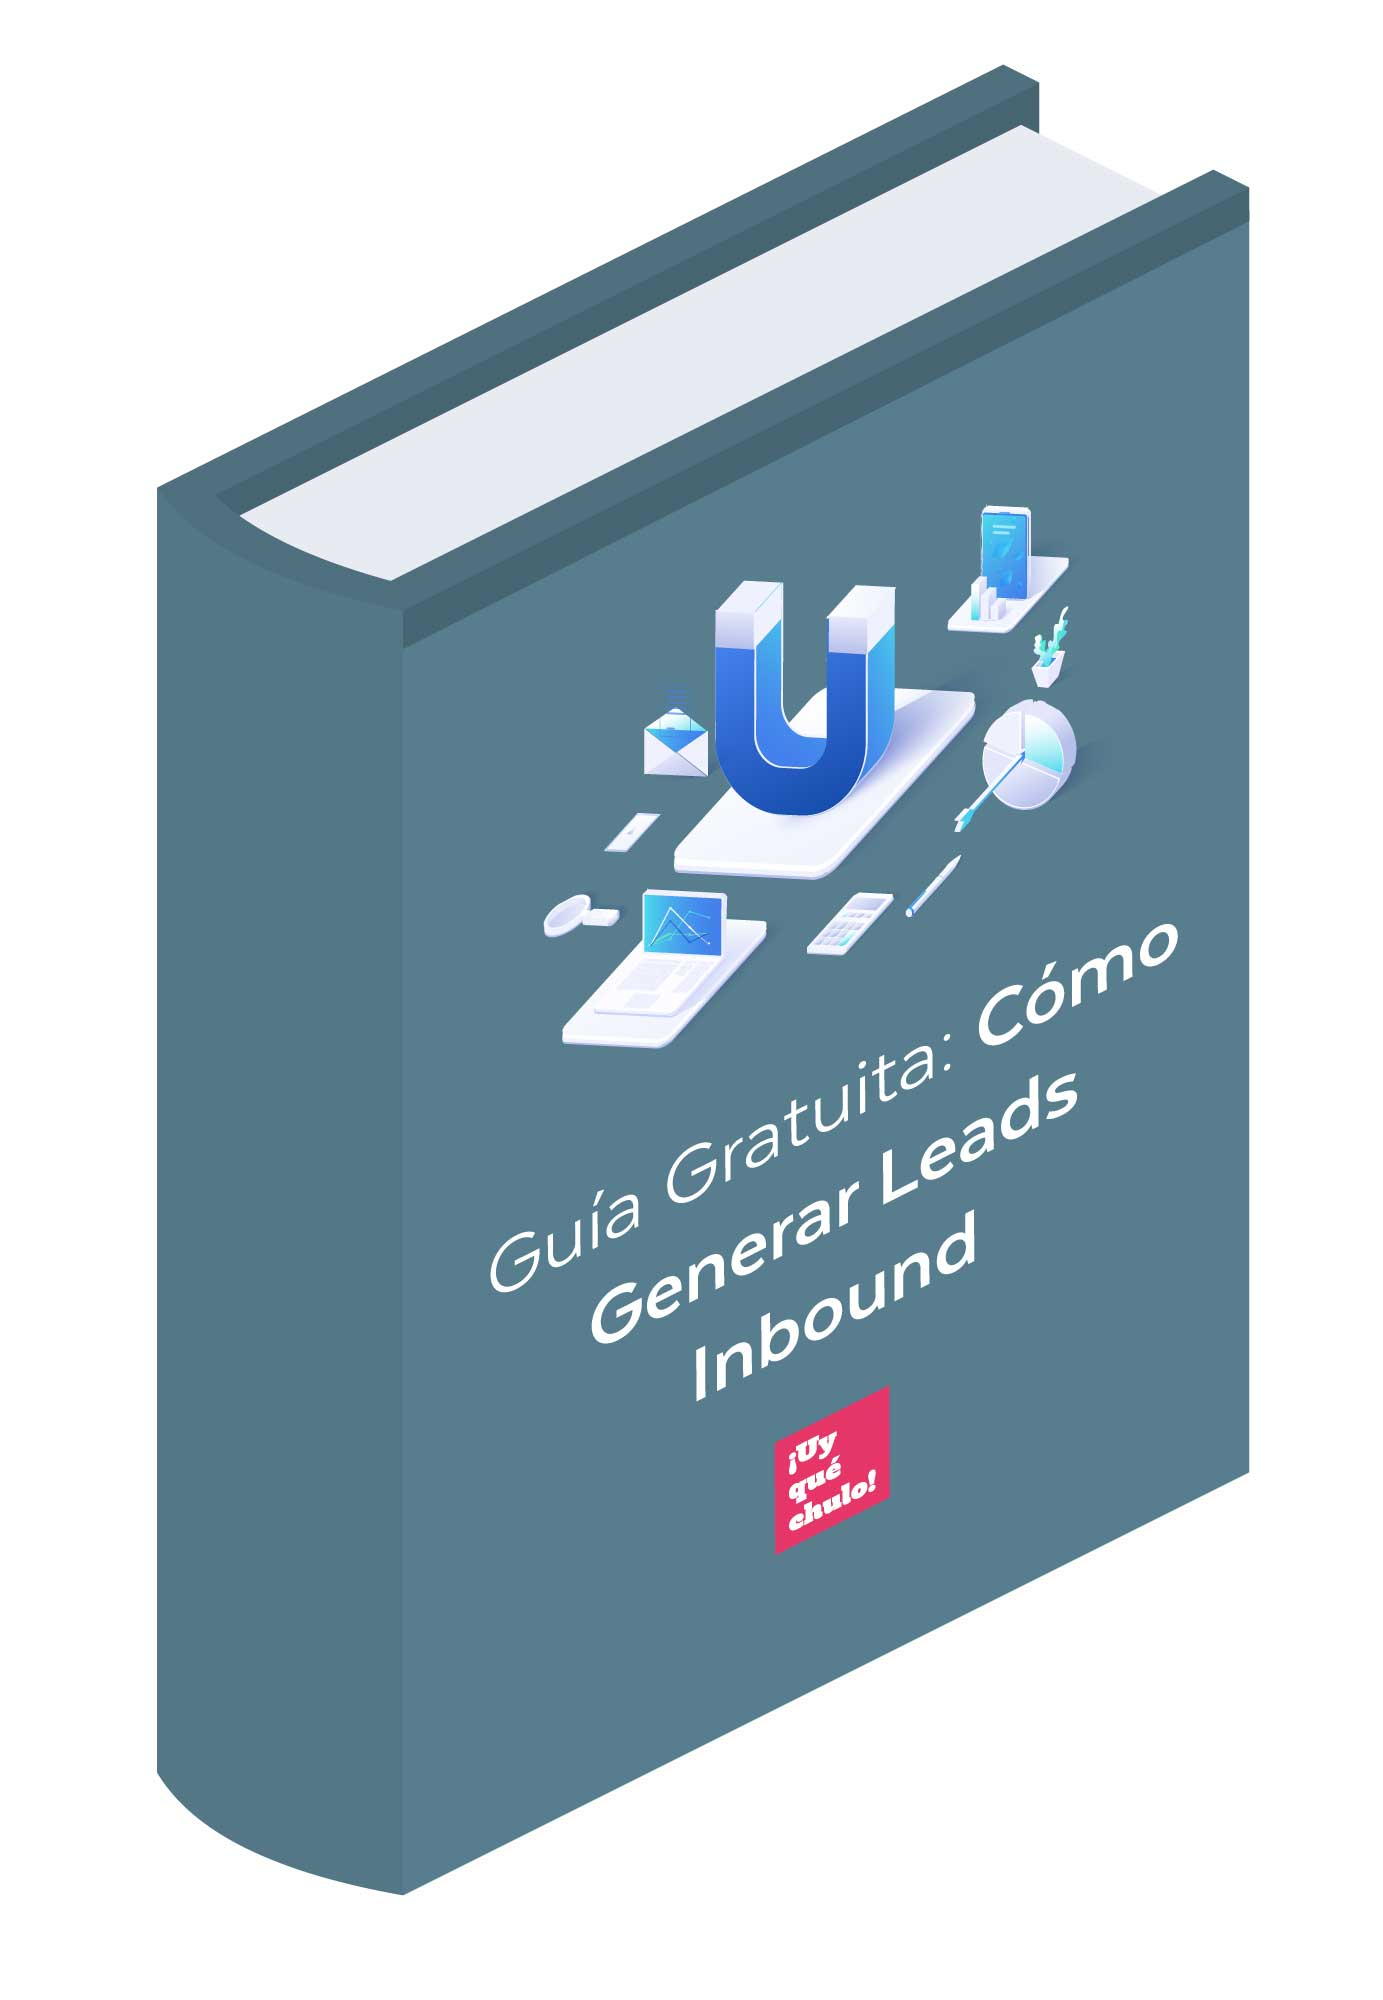 guia-gratuita-como-generar-leads-inbound